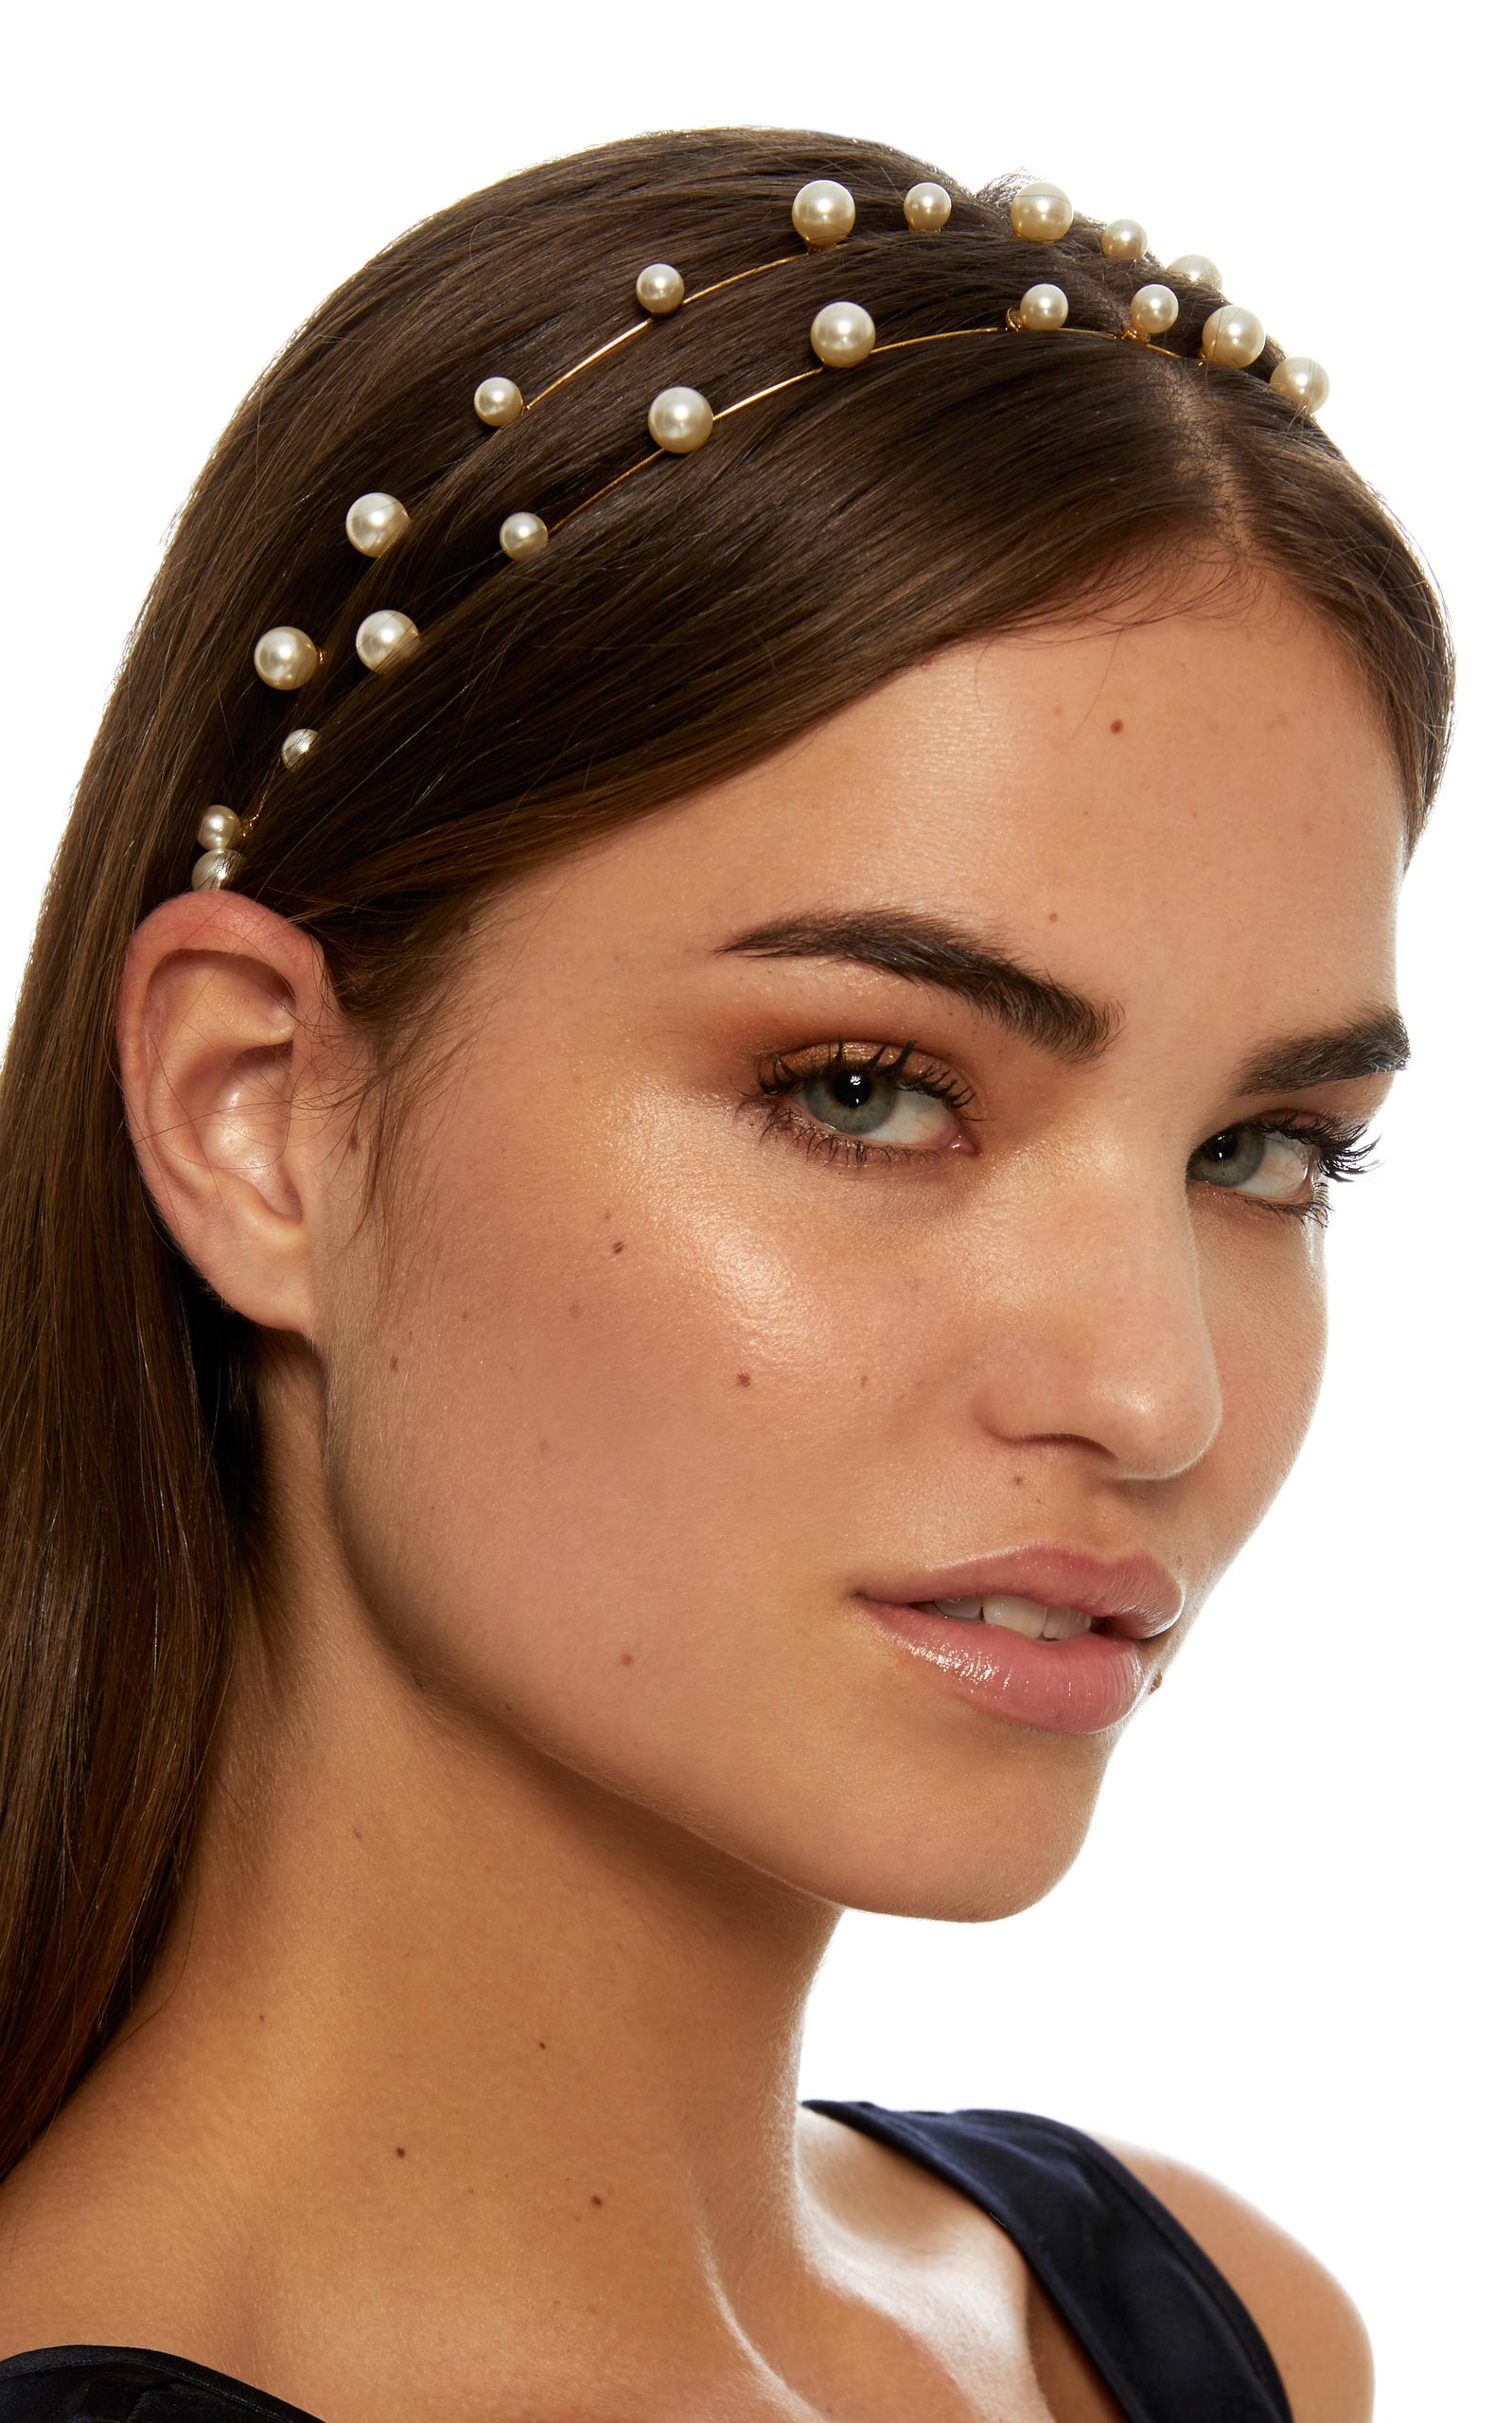 Sybil Bandeaux Gold-Plated Headband by Jennifer Behr  3f3f399fdbf